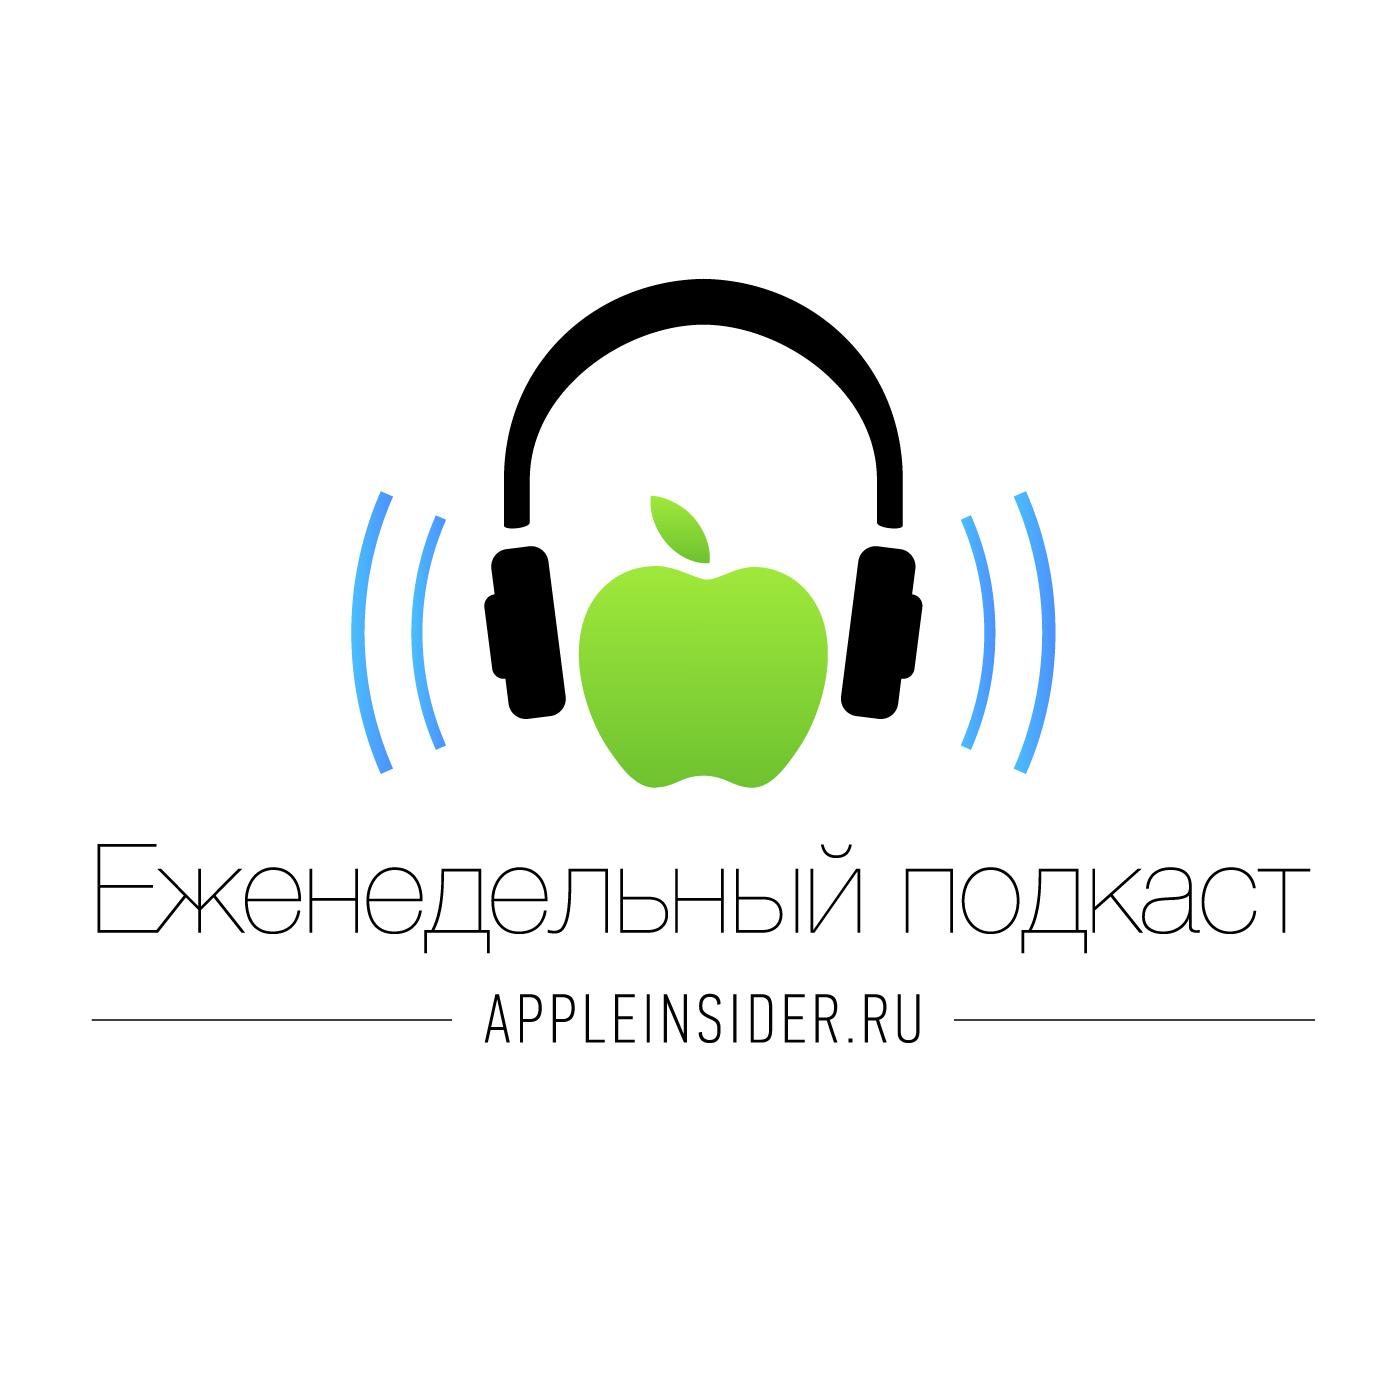 Миша Королев Итоги презентации WWDC 2017 итоги